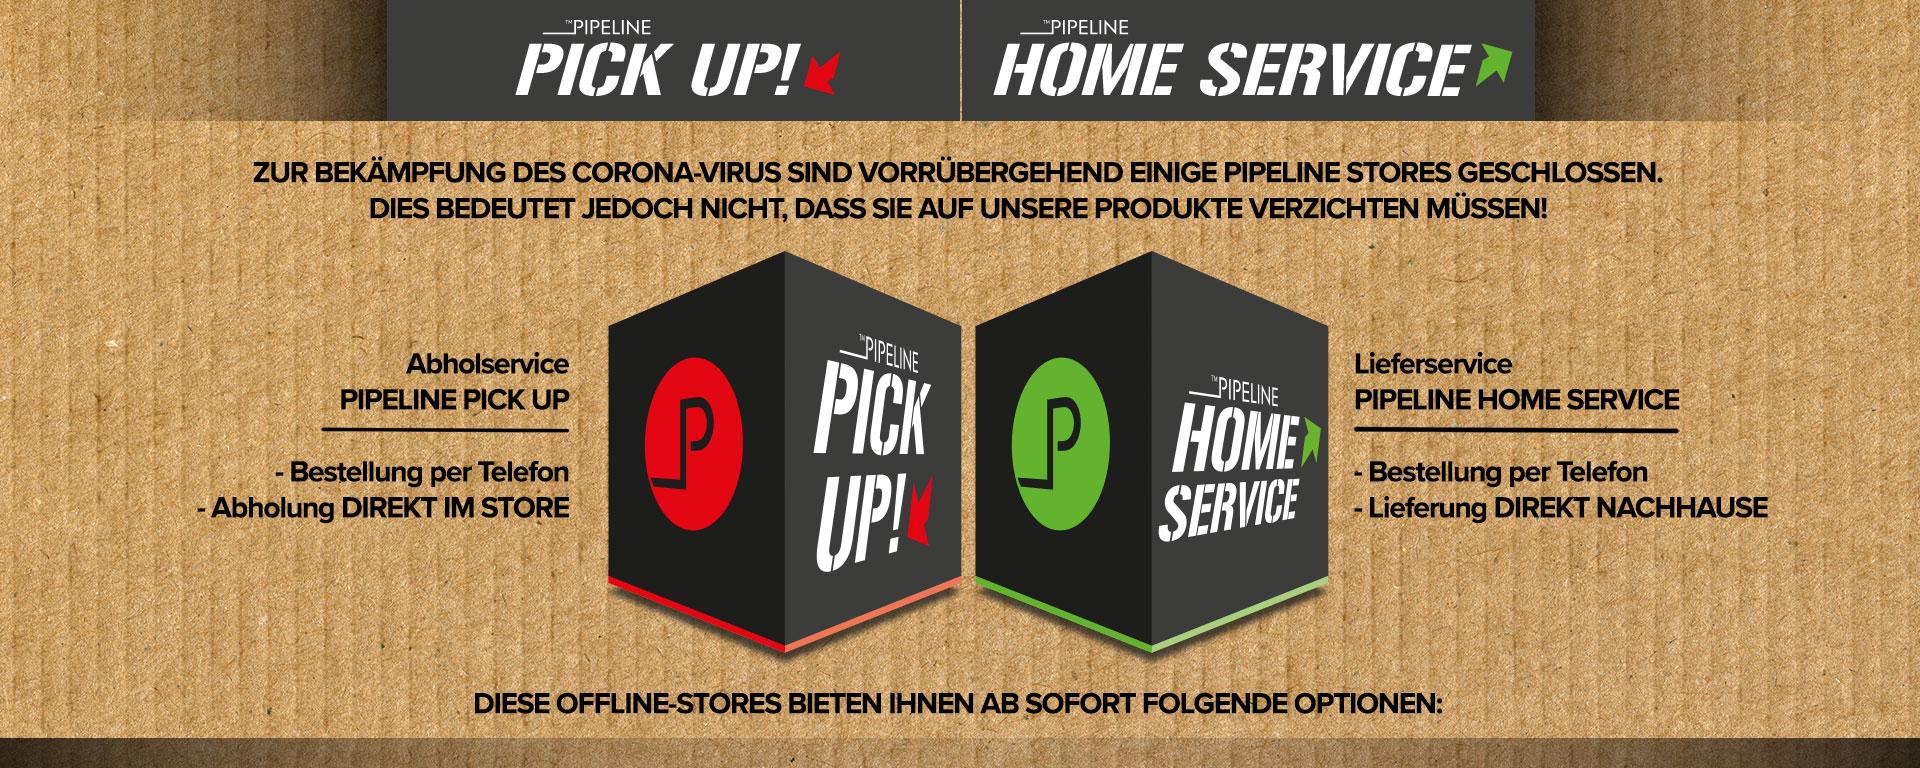 slider-pickup-lieferservice_96_newd33KFx2qzNudn